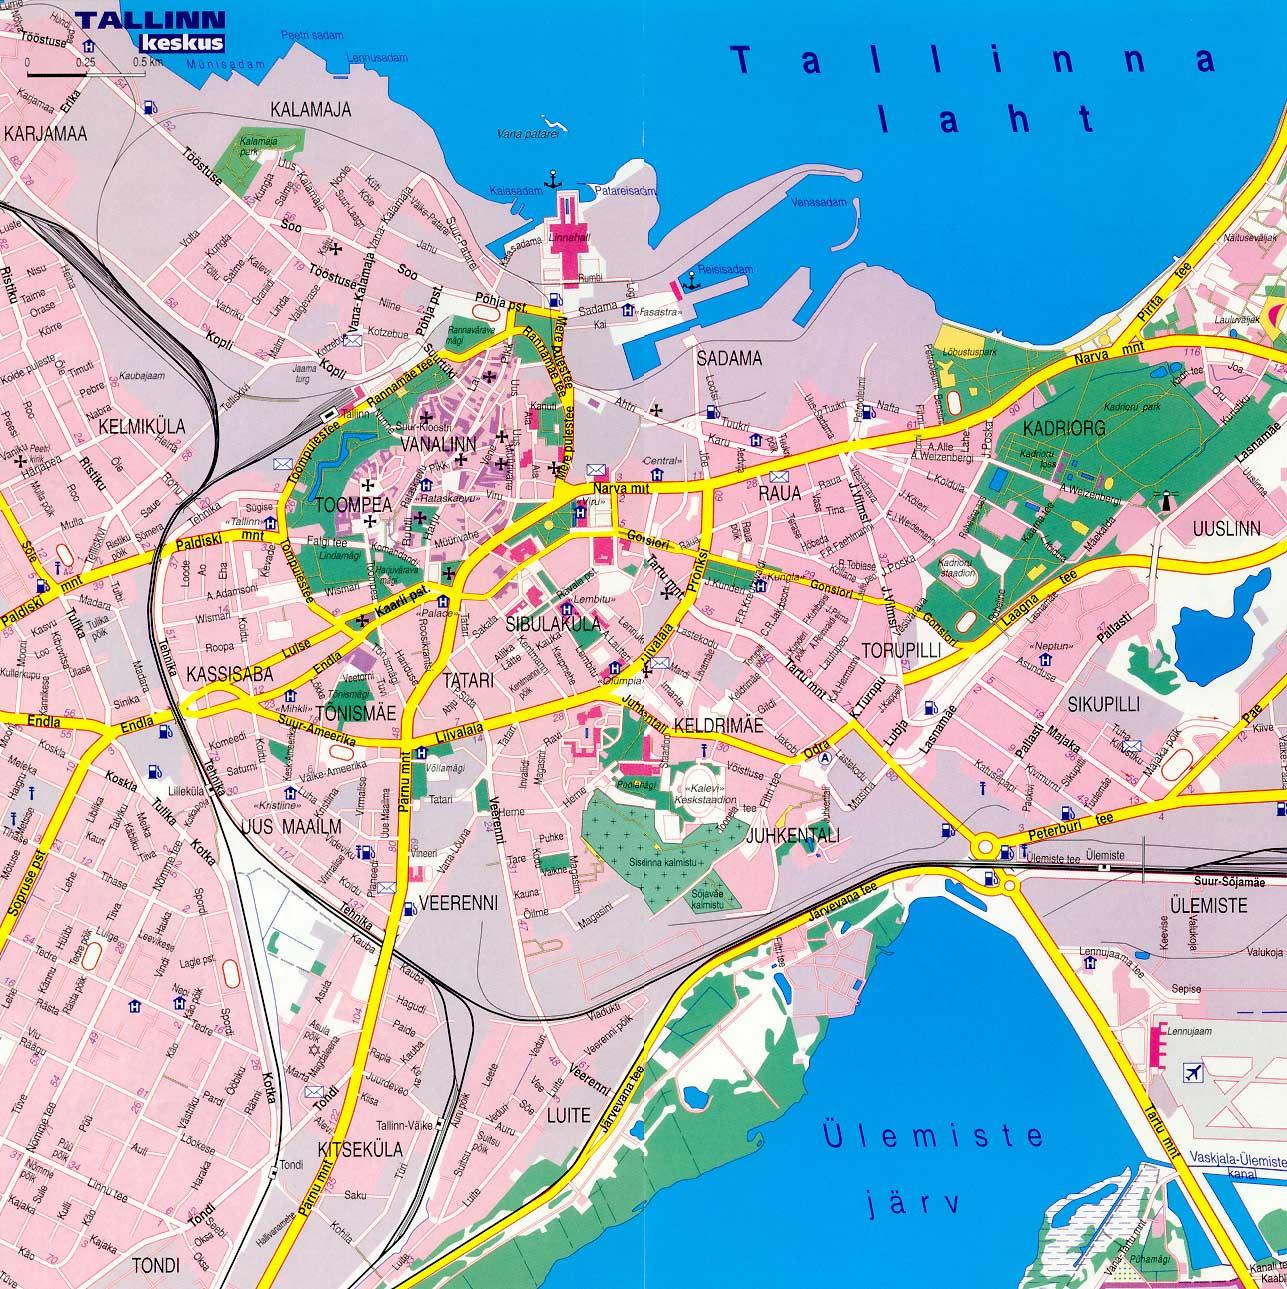 Mapa Grande de Tallinn, Estónia 20